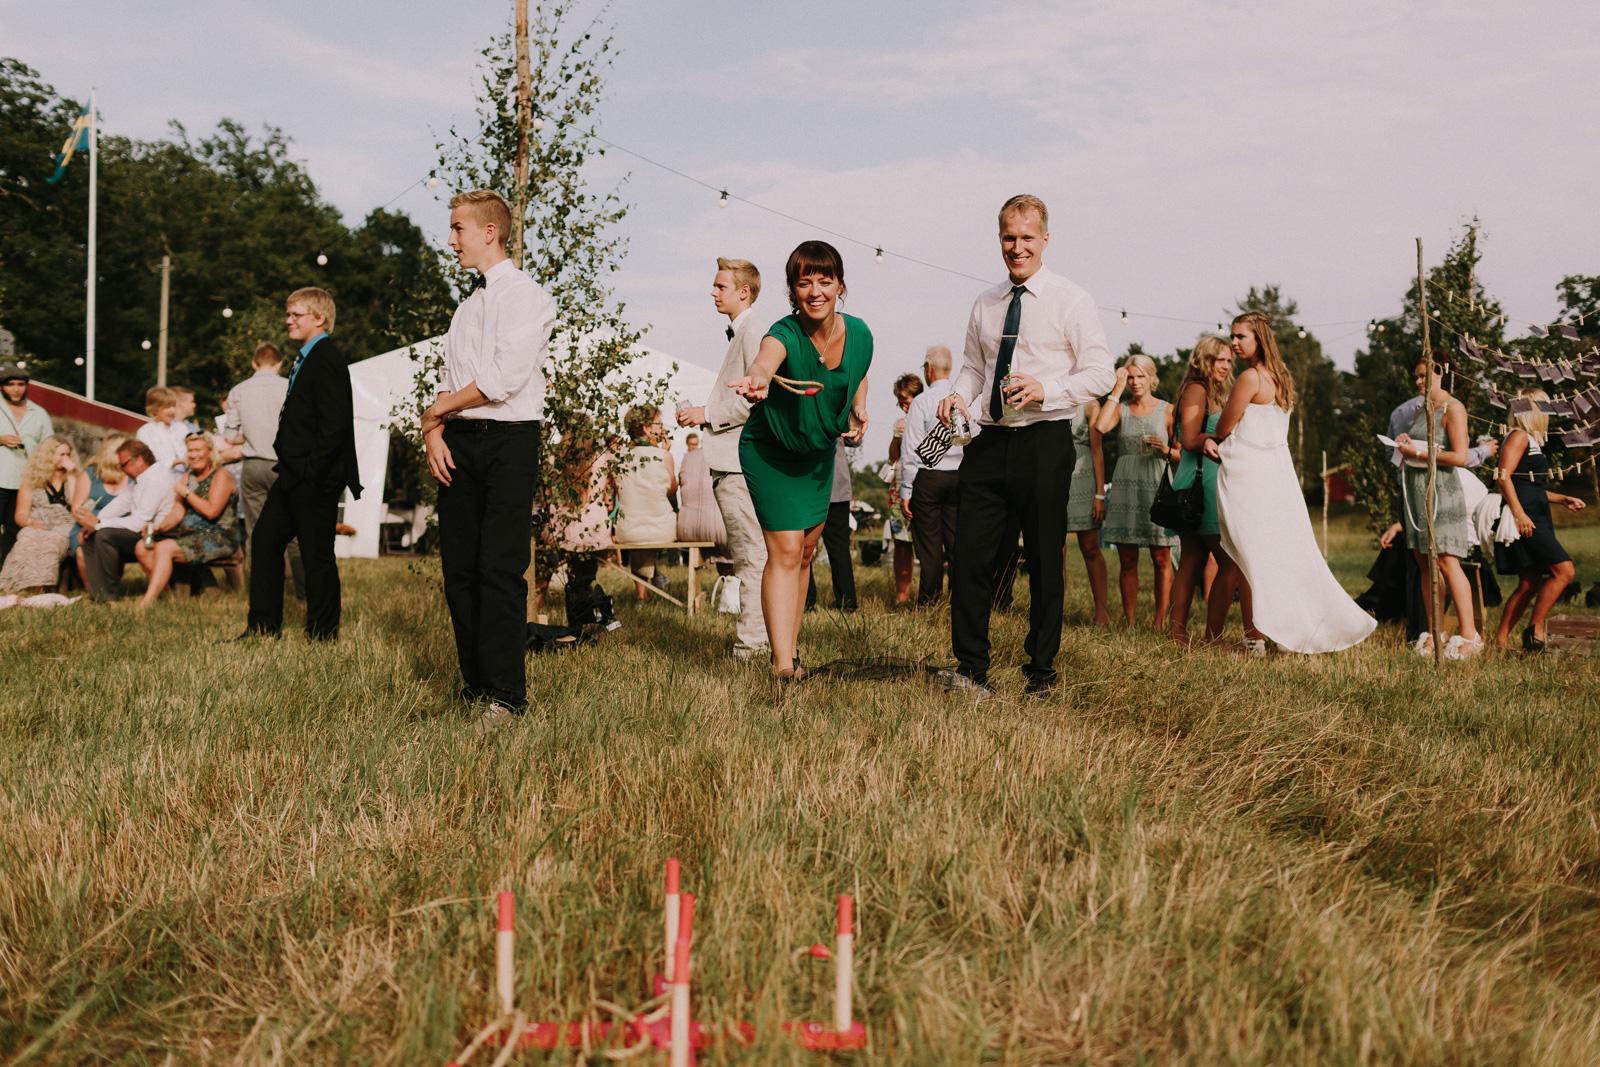 sweden-wedding-games